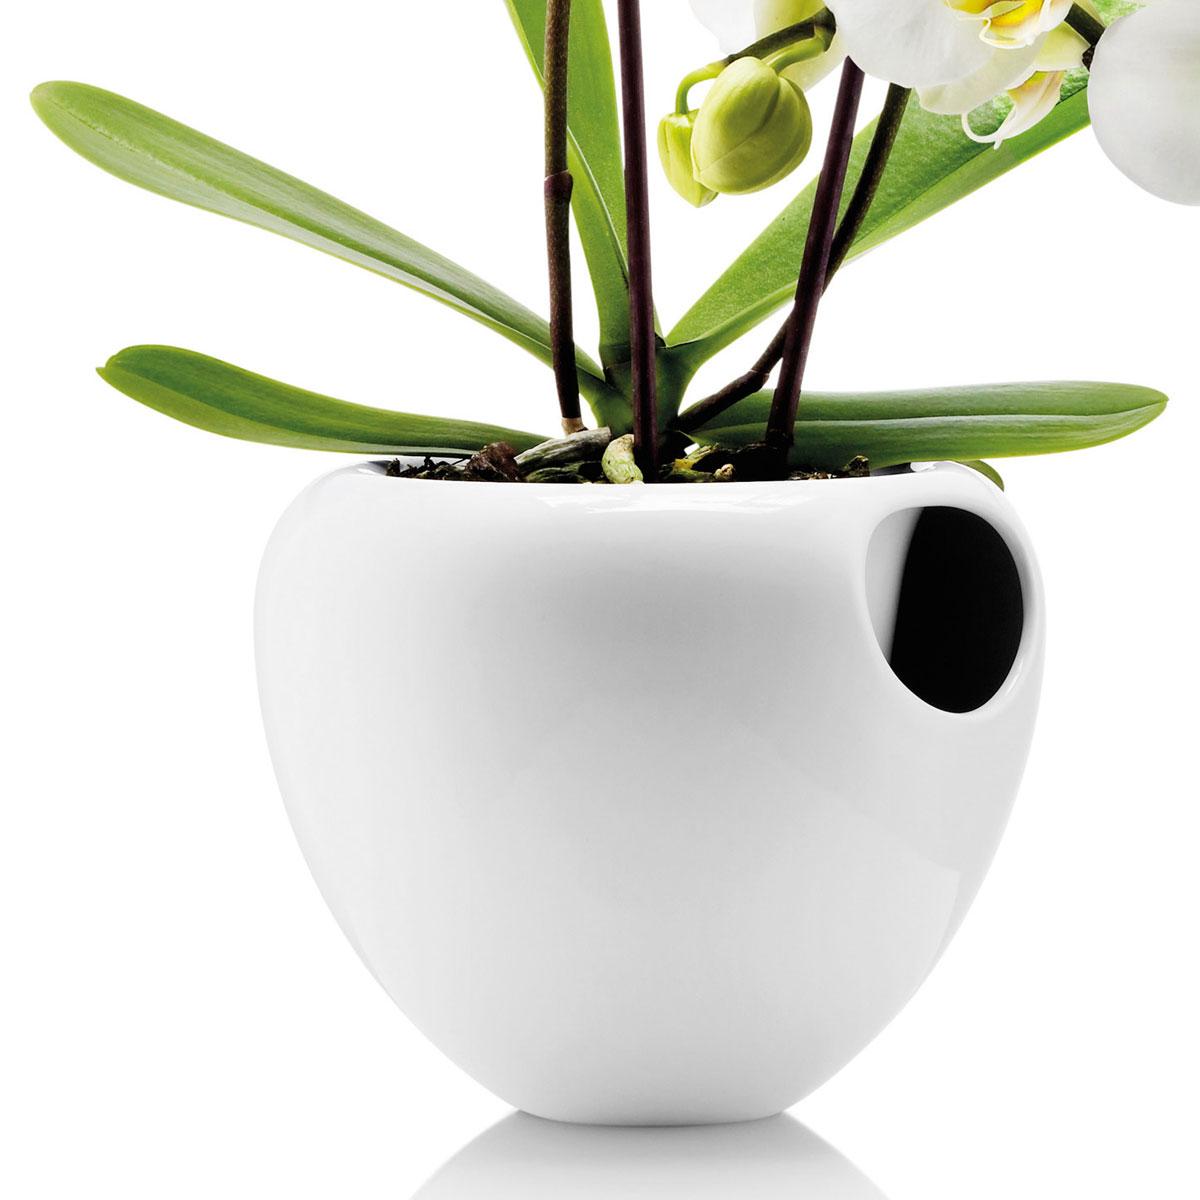 selbstw ssernder orchideentopf von eva solo designs2love. Black Bedroom Furniture Sets. Home Design Ideas